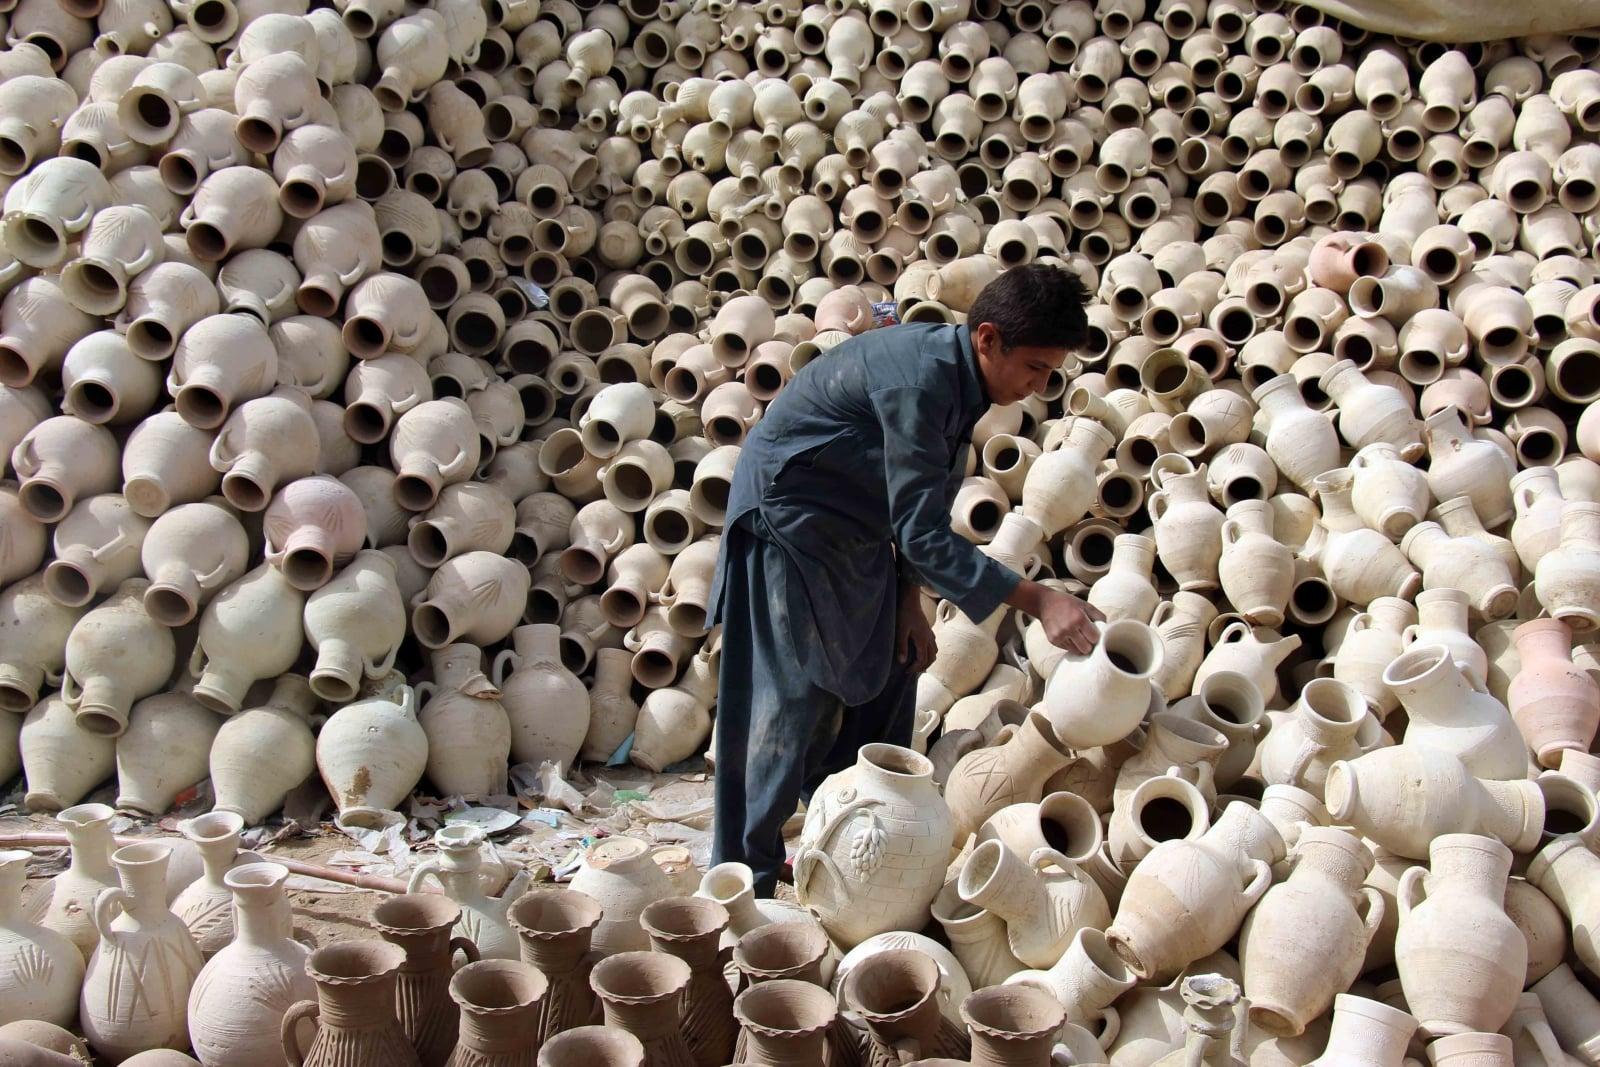 Afganistan EPA/MUHAMMAD SADIQ